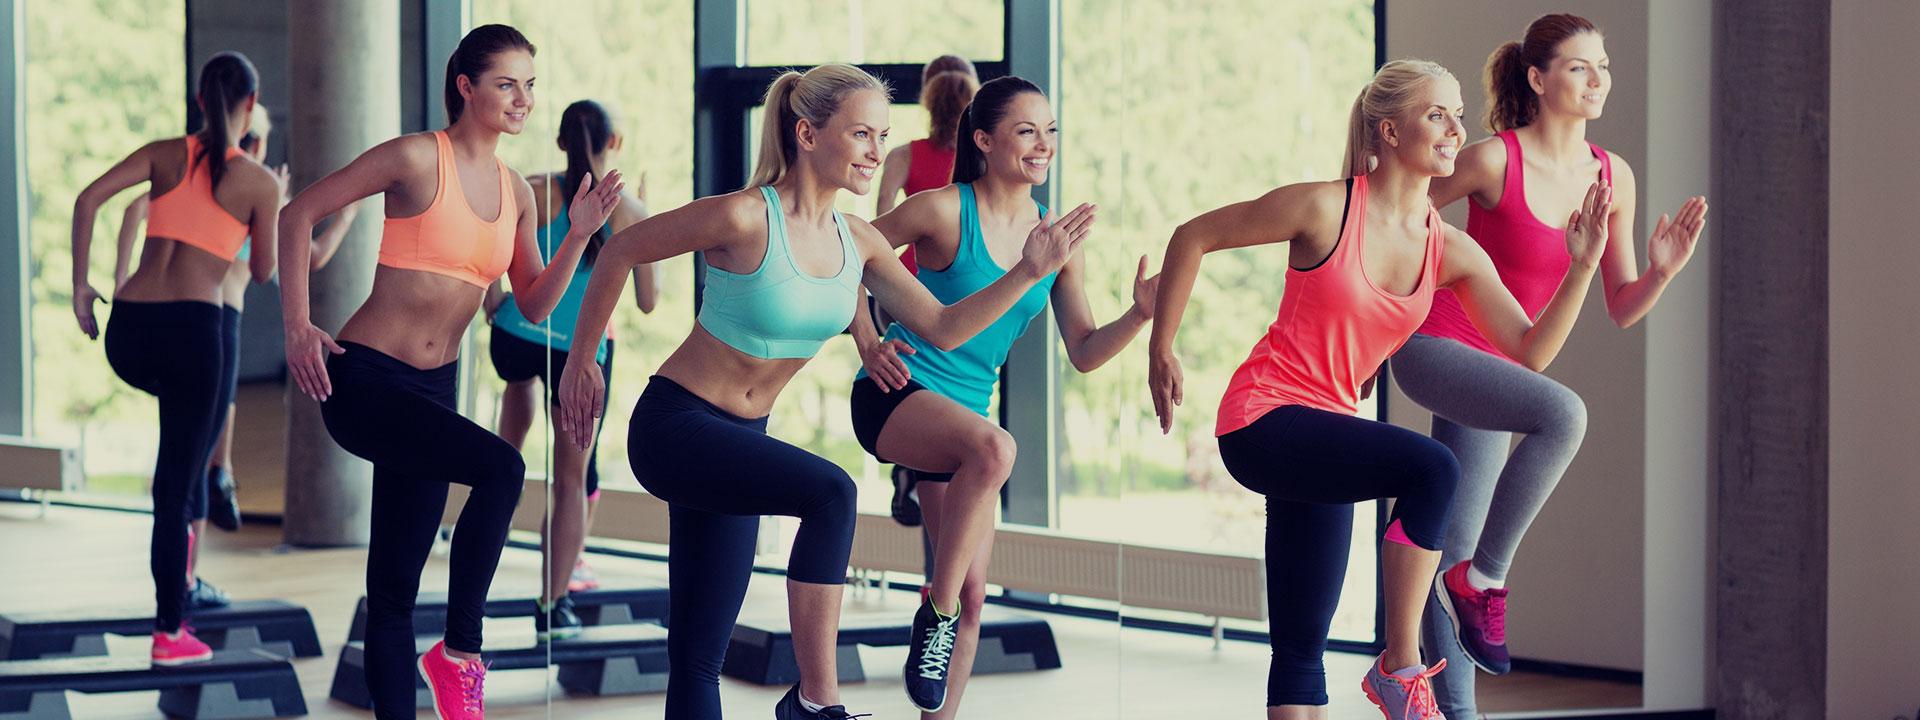 FitPur Trainingskurs für Frauen